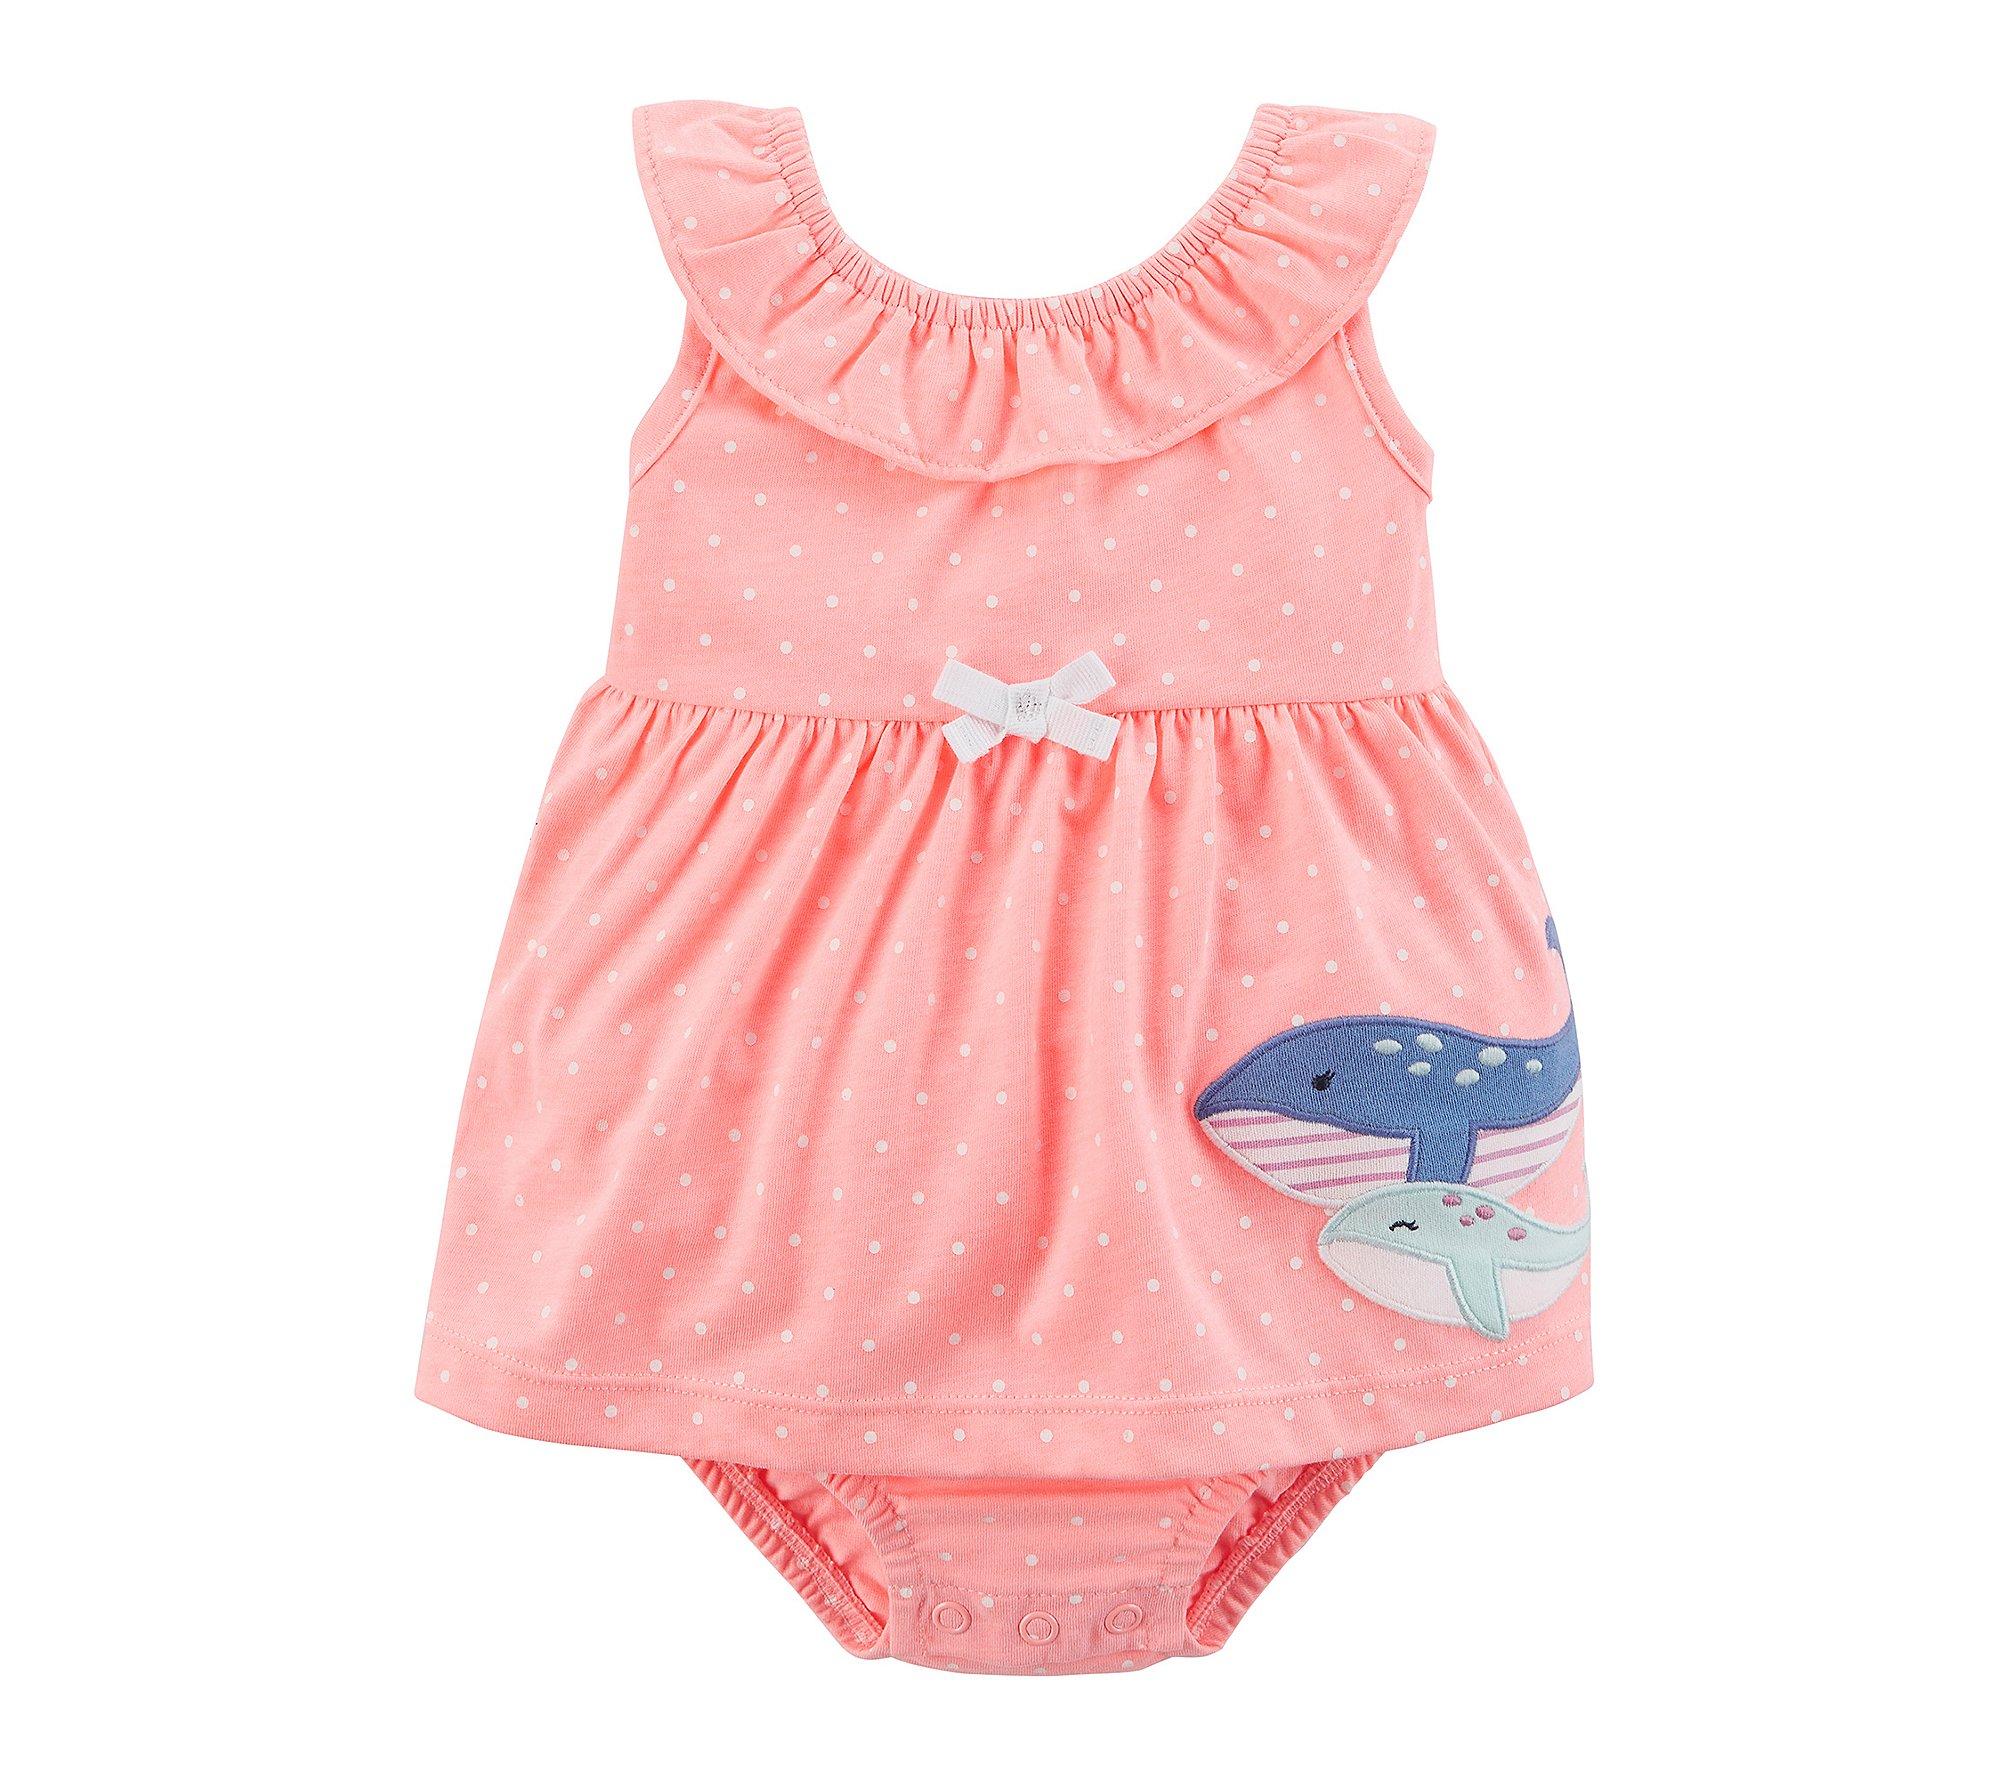 Carter's Baby Girls' 1 Piece Sunsuit 6 Months